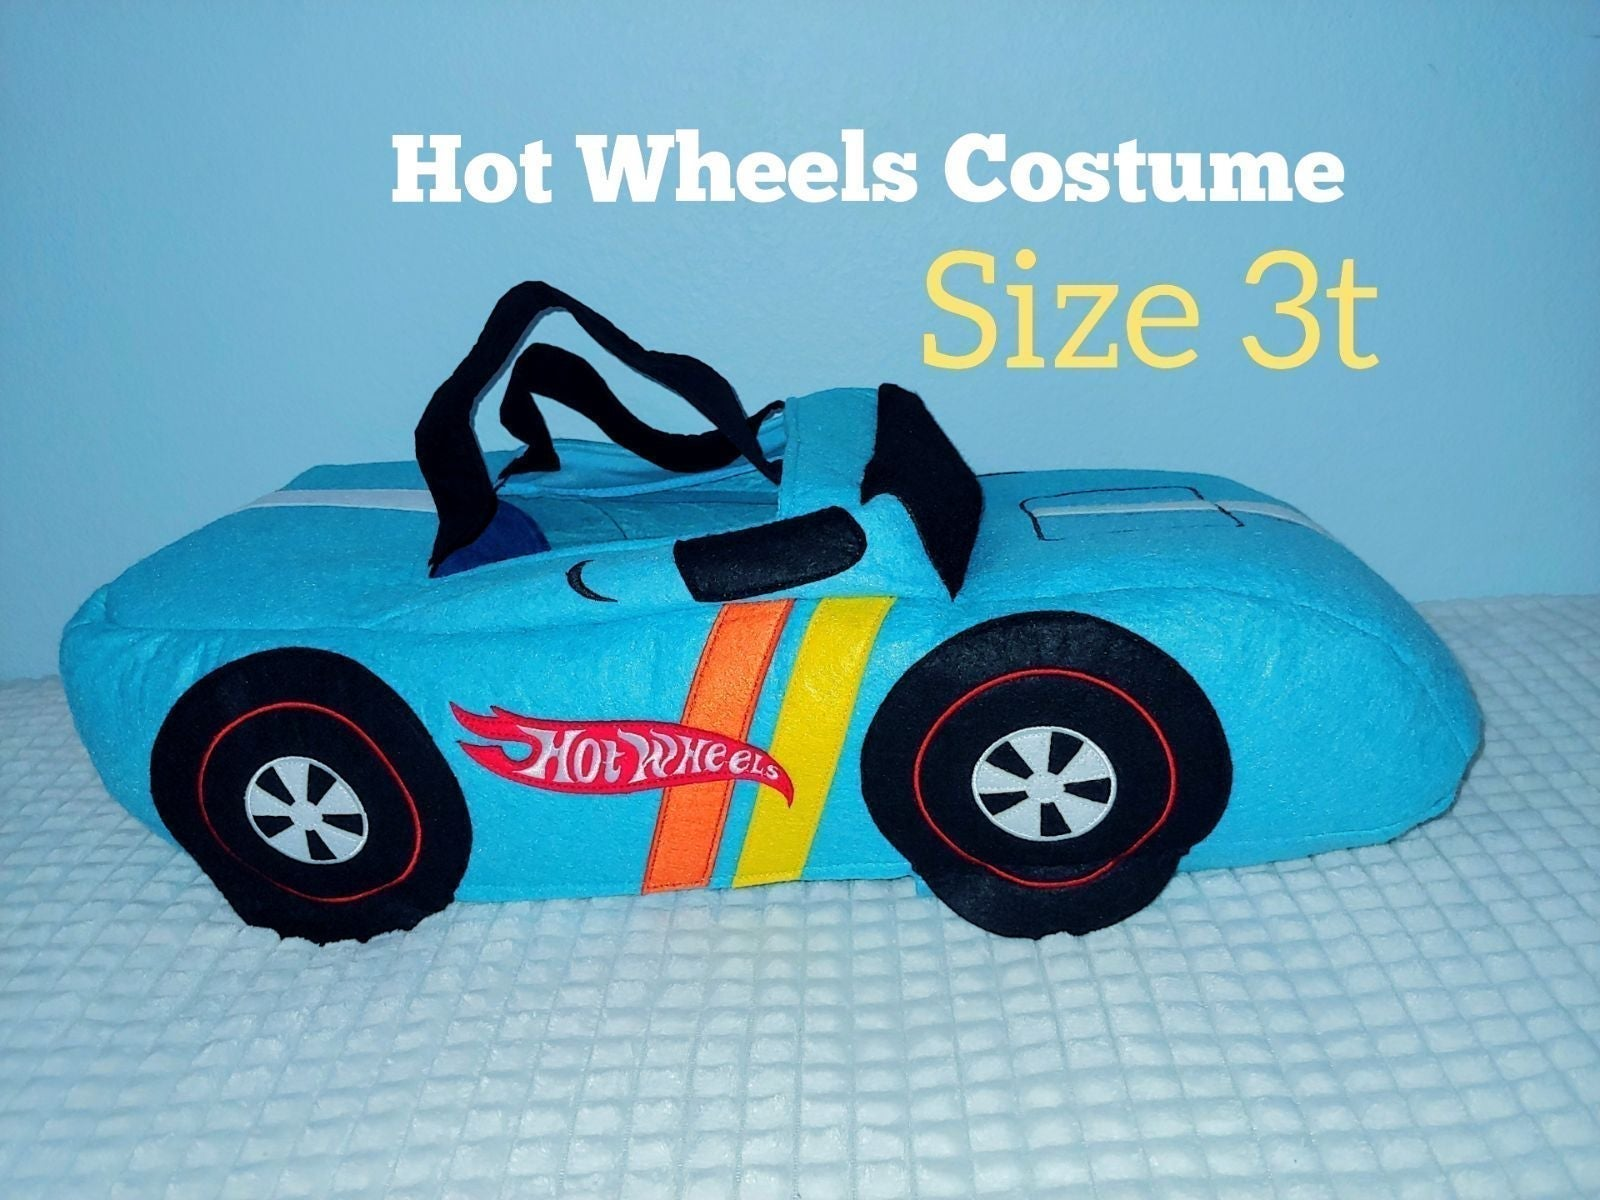 3t Pottery Barn Hot Wheels Costume